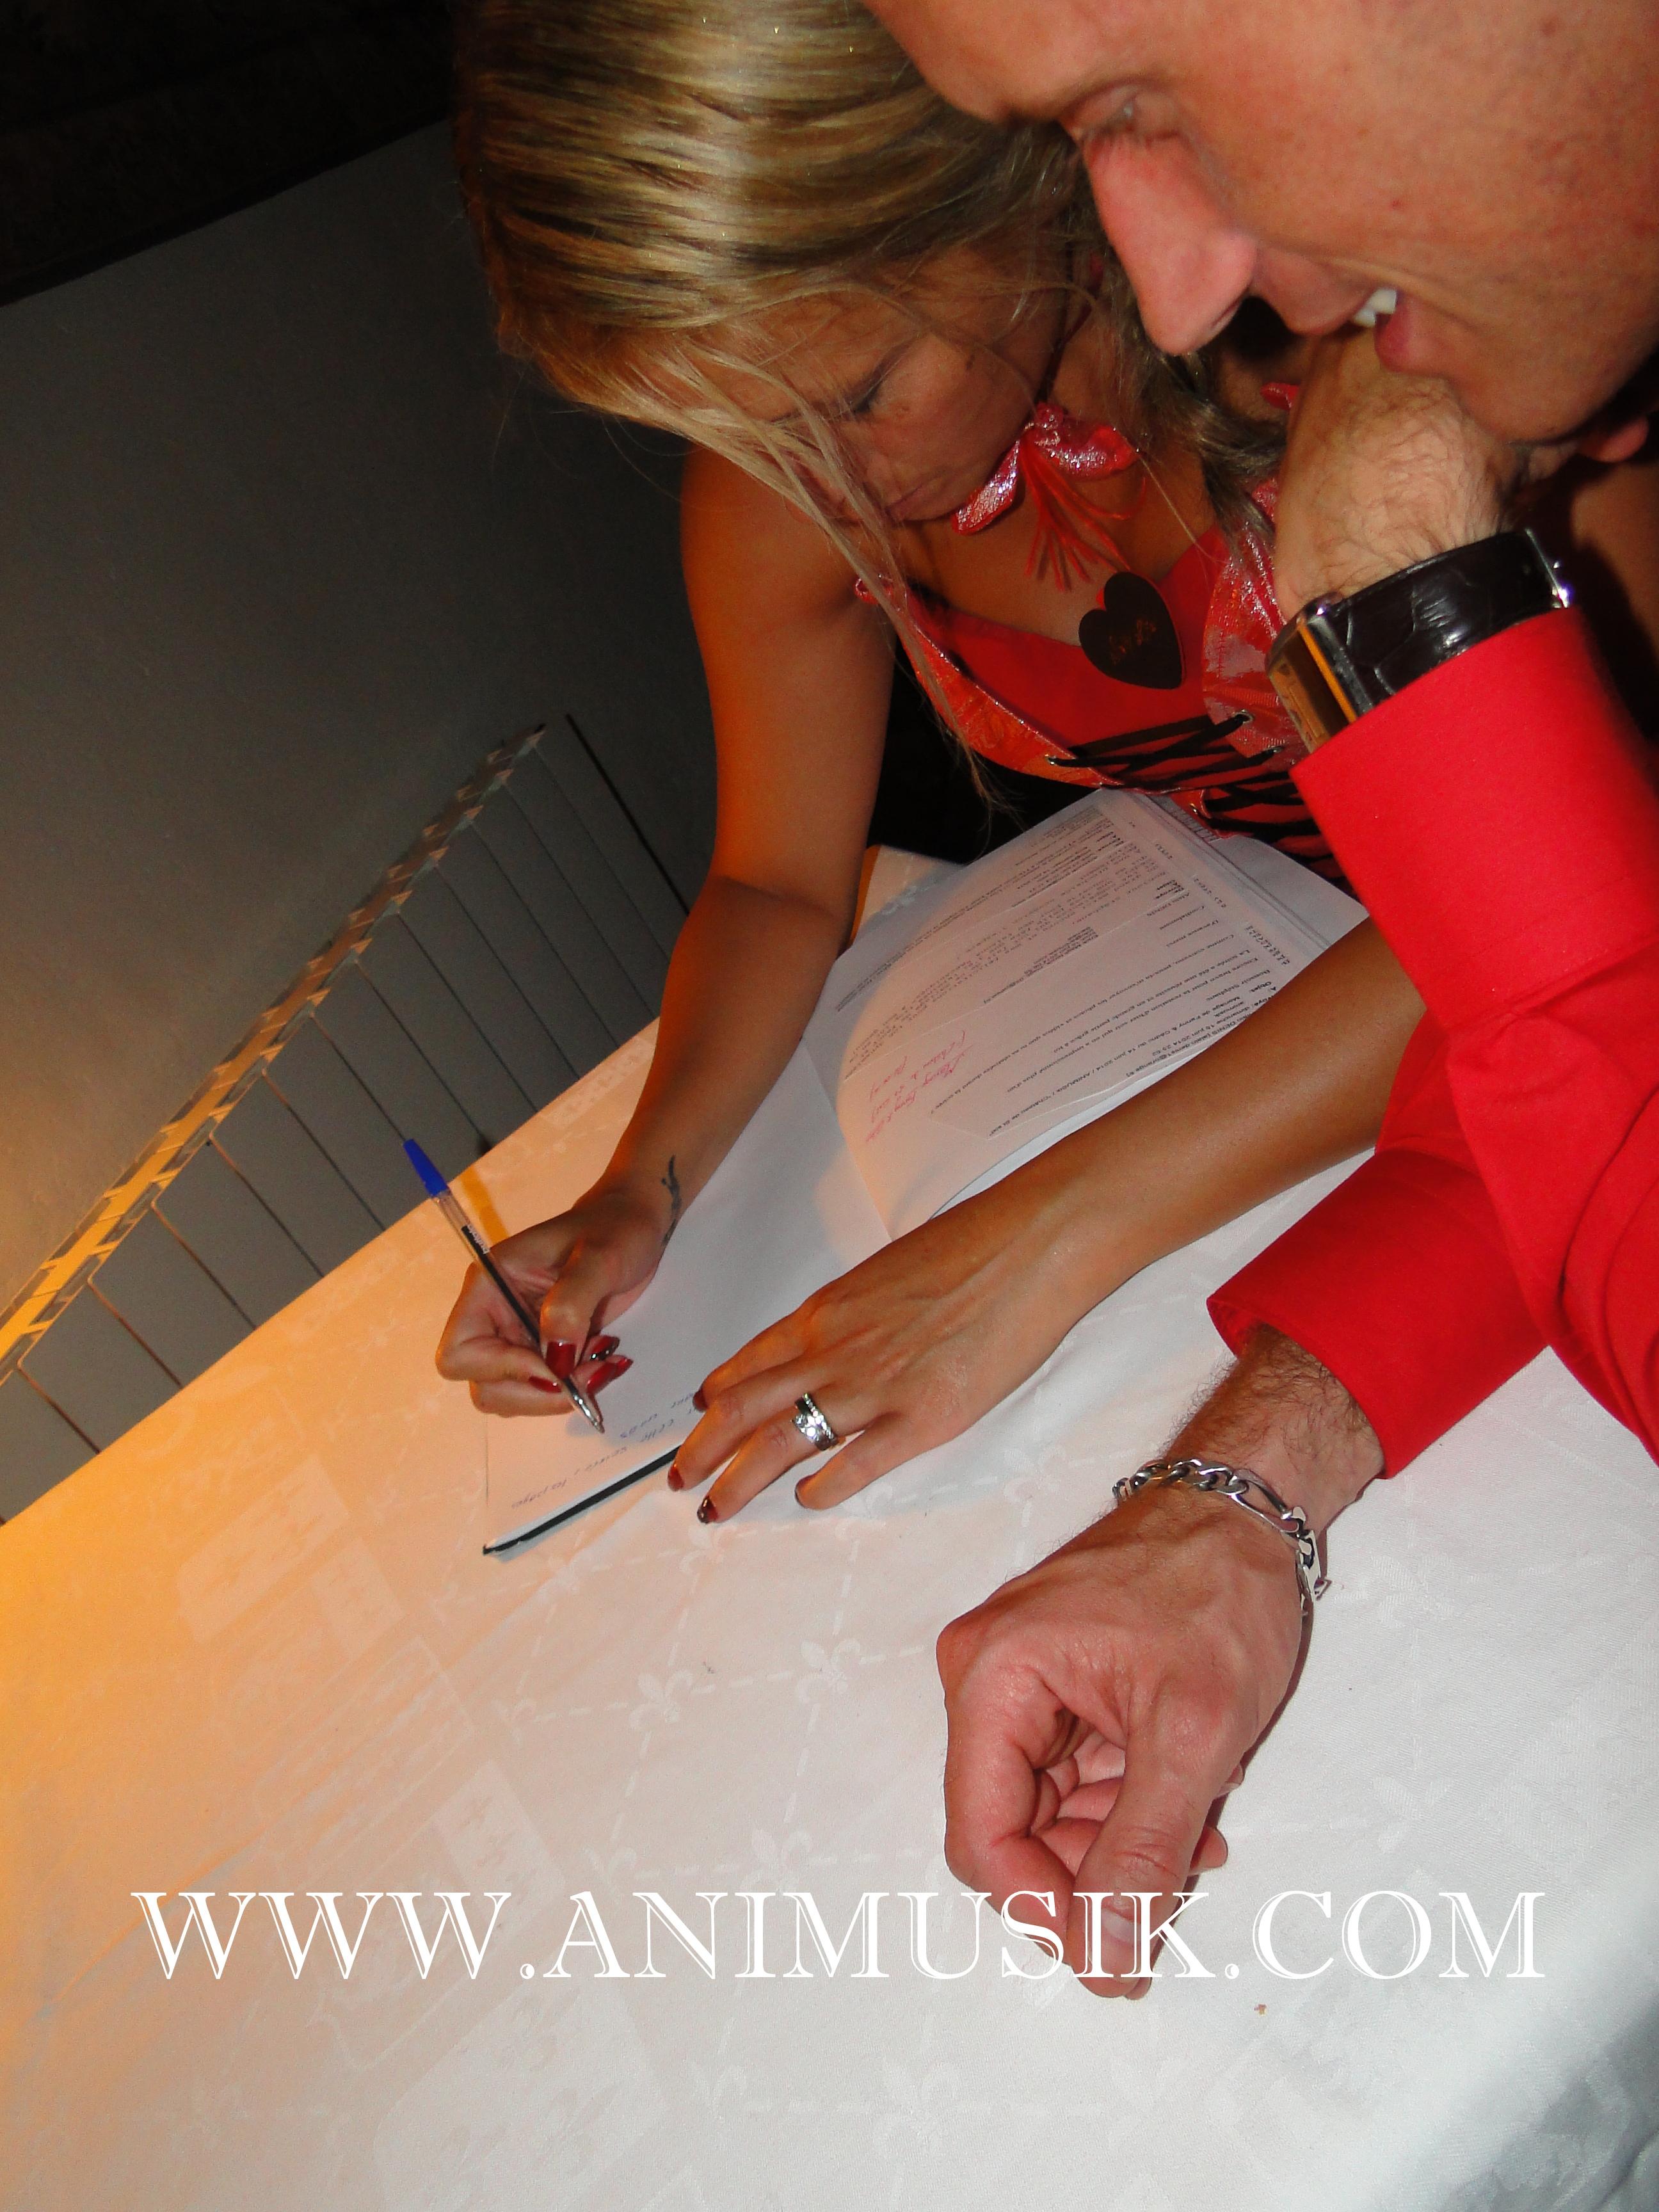 ANIMUSIK La Passion de l'Animation (120).JPG